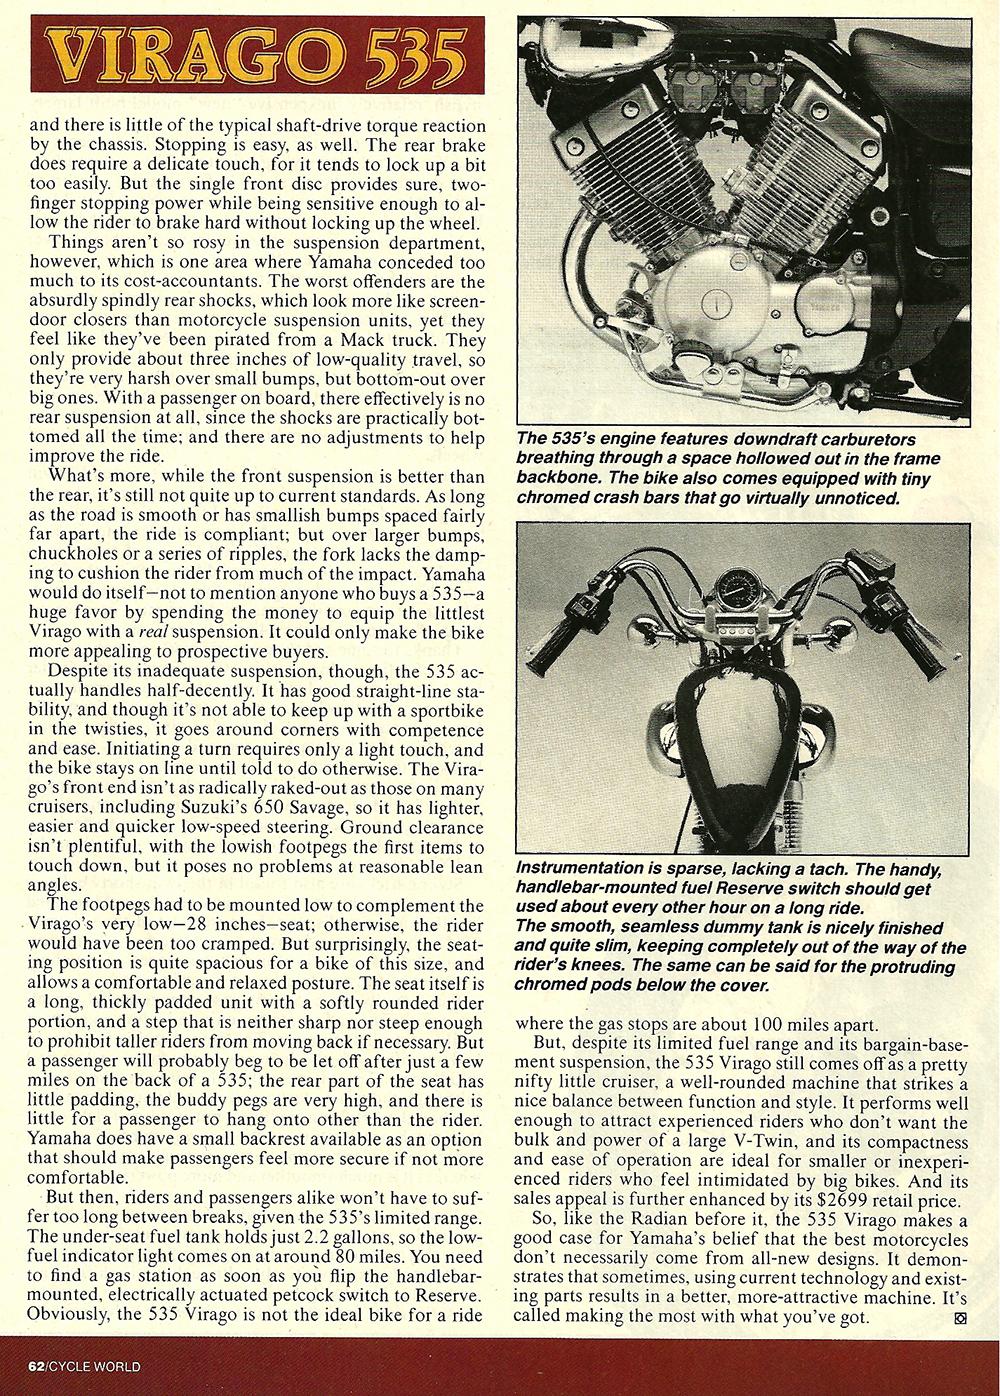 1987 Yamaha Virago 535 road test 03.jpg